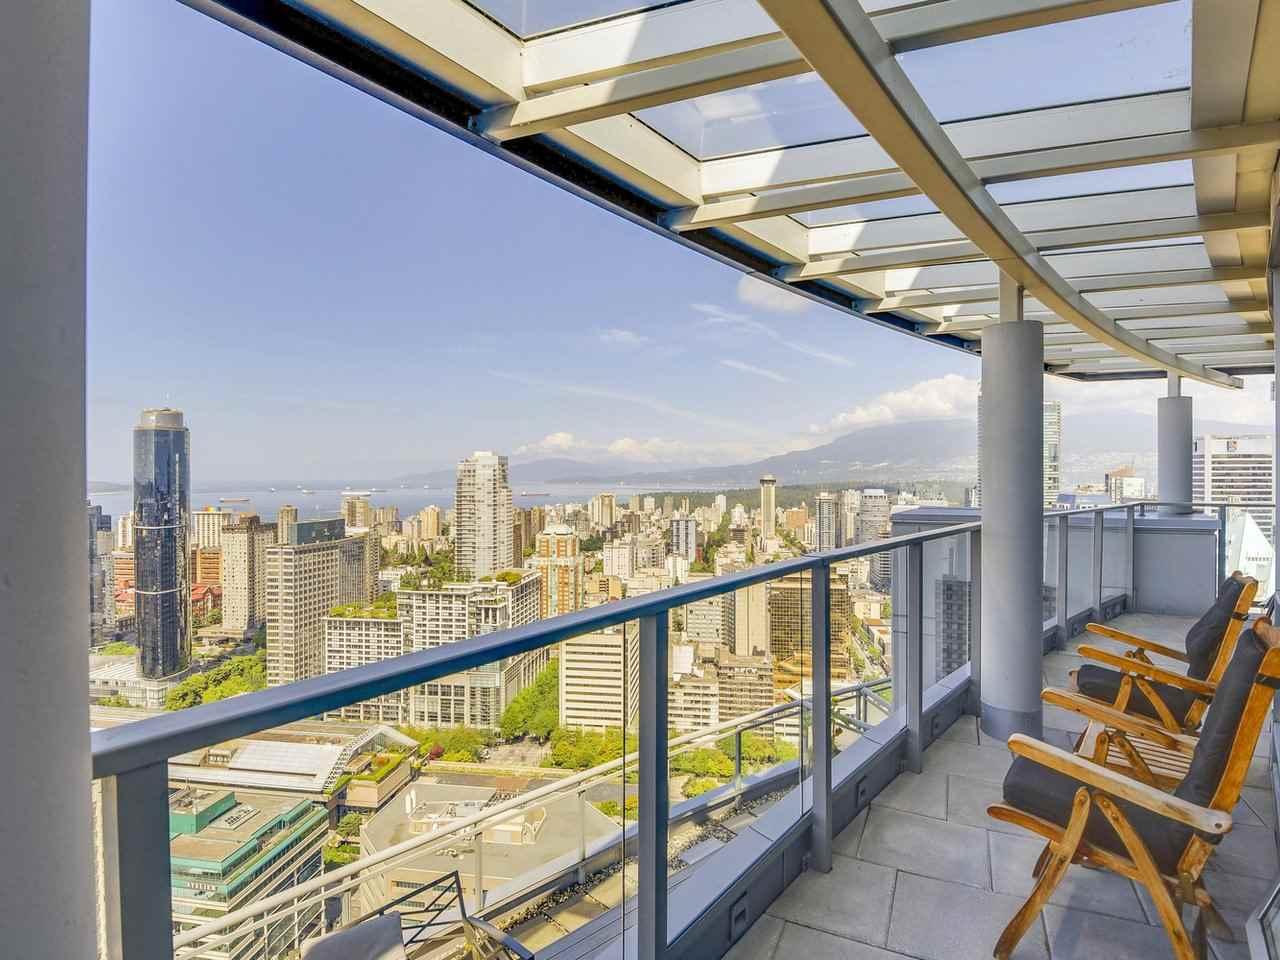 Condo Apartment at PH3 833 SEYMOUR STREET, Unit PH3, Vancouver West, British Columbia. Image 1